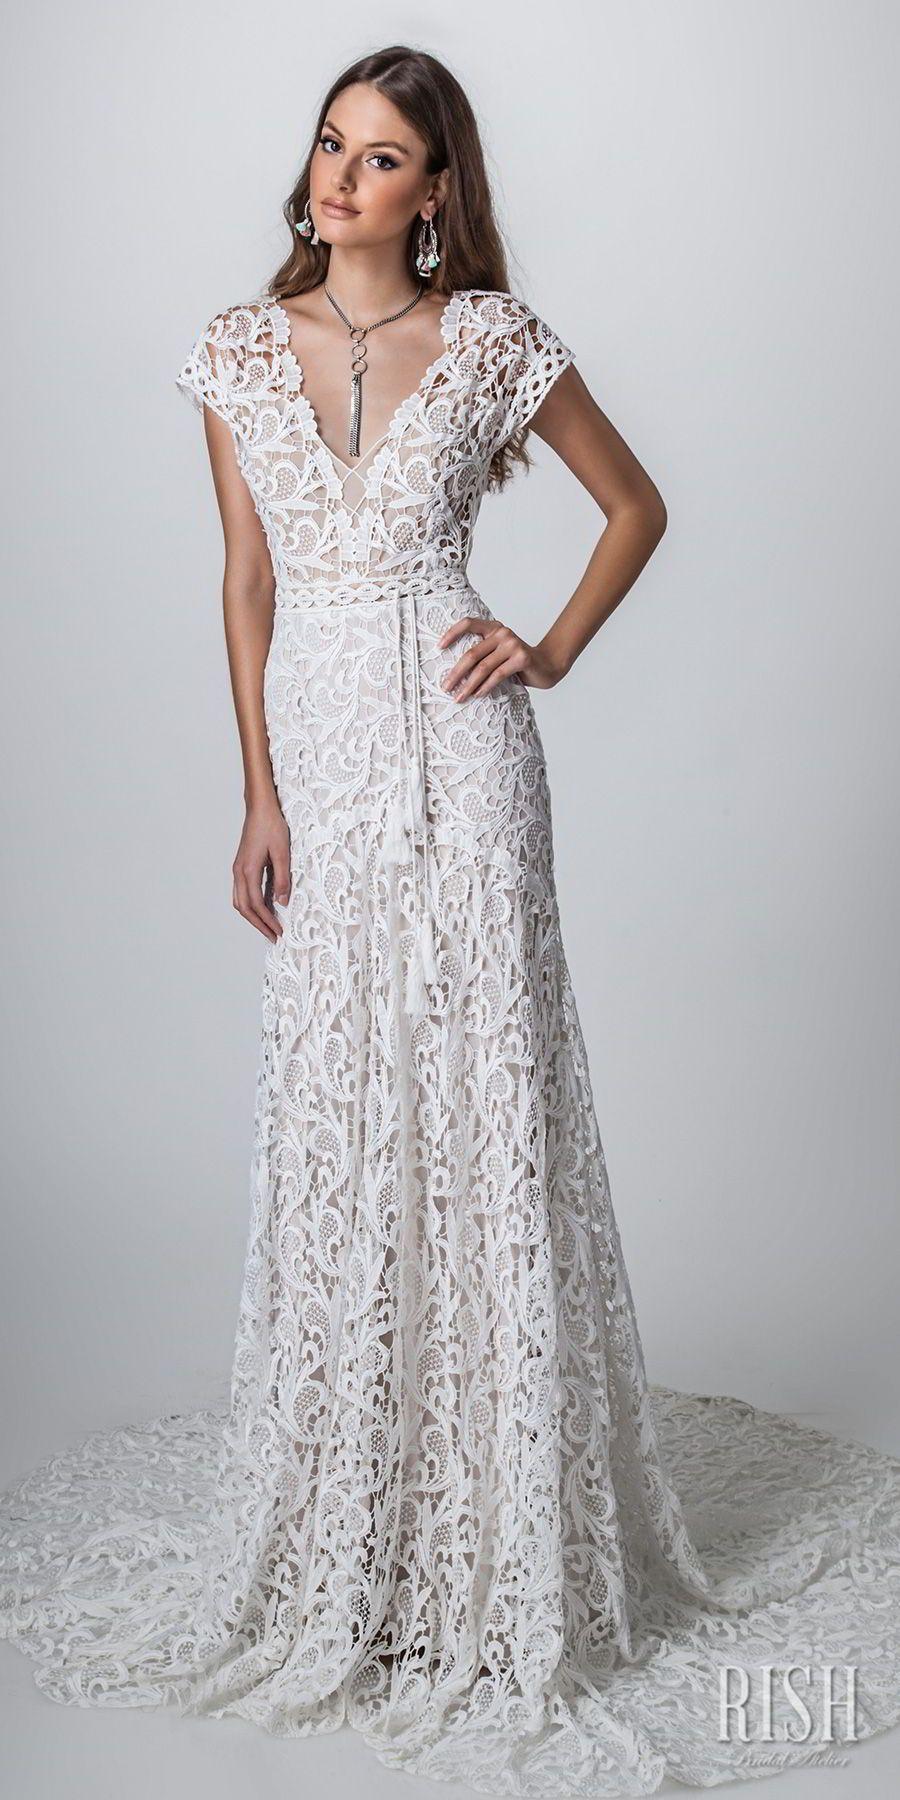 Short boho wedding dress  Rish Bridal  ucSun Danceud Collection u Boho Chic Wedding Dresses